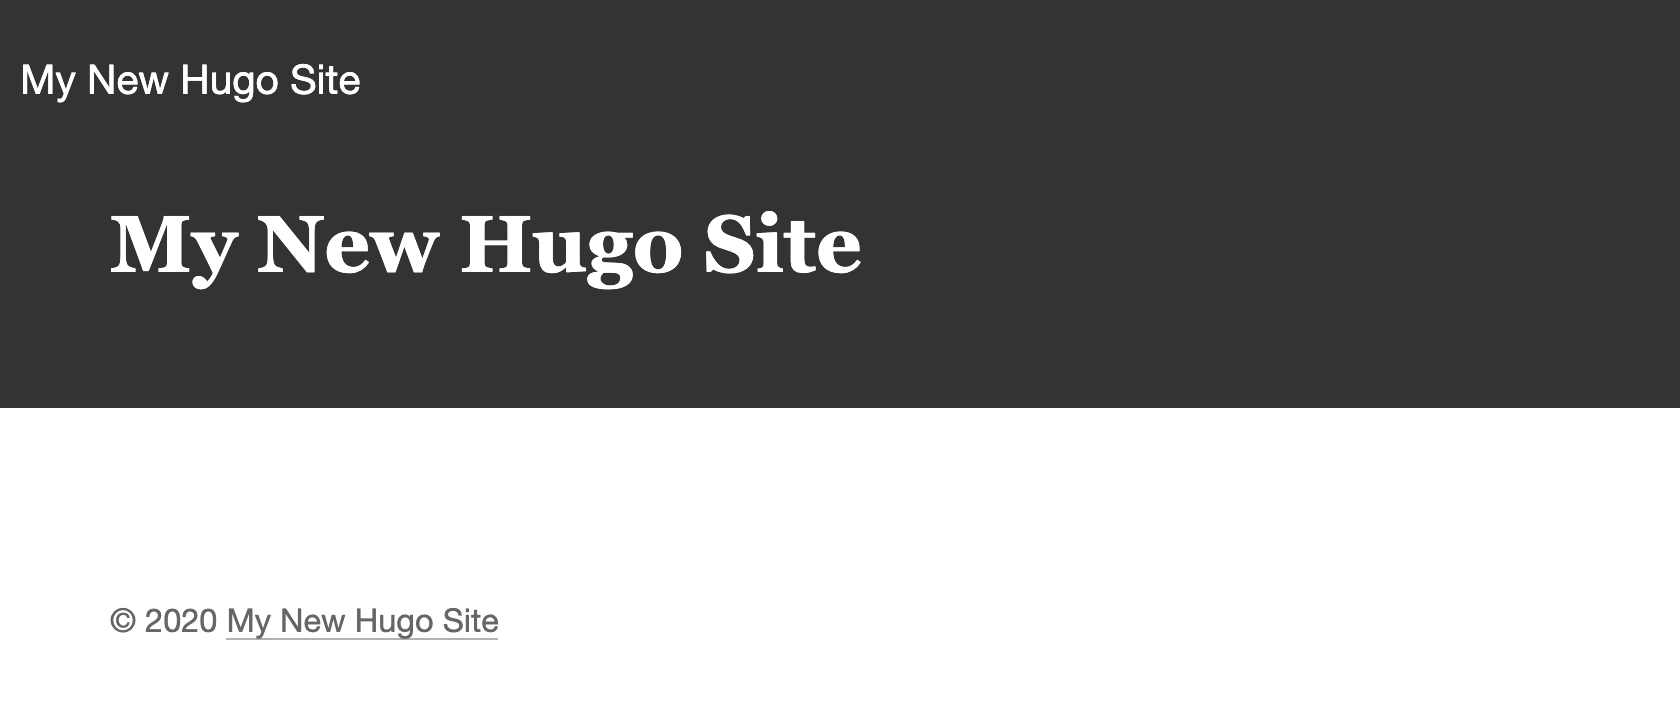 FireShot Capture 003 - My New Hugo Site - My New Hugo Site - localhost